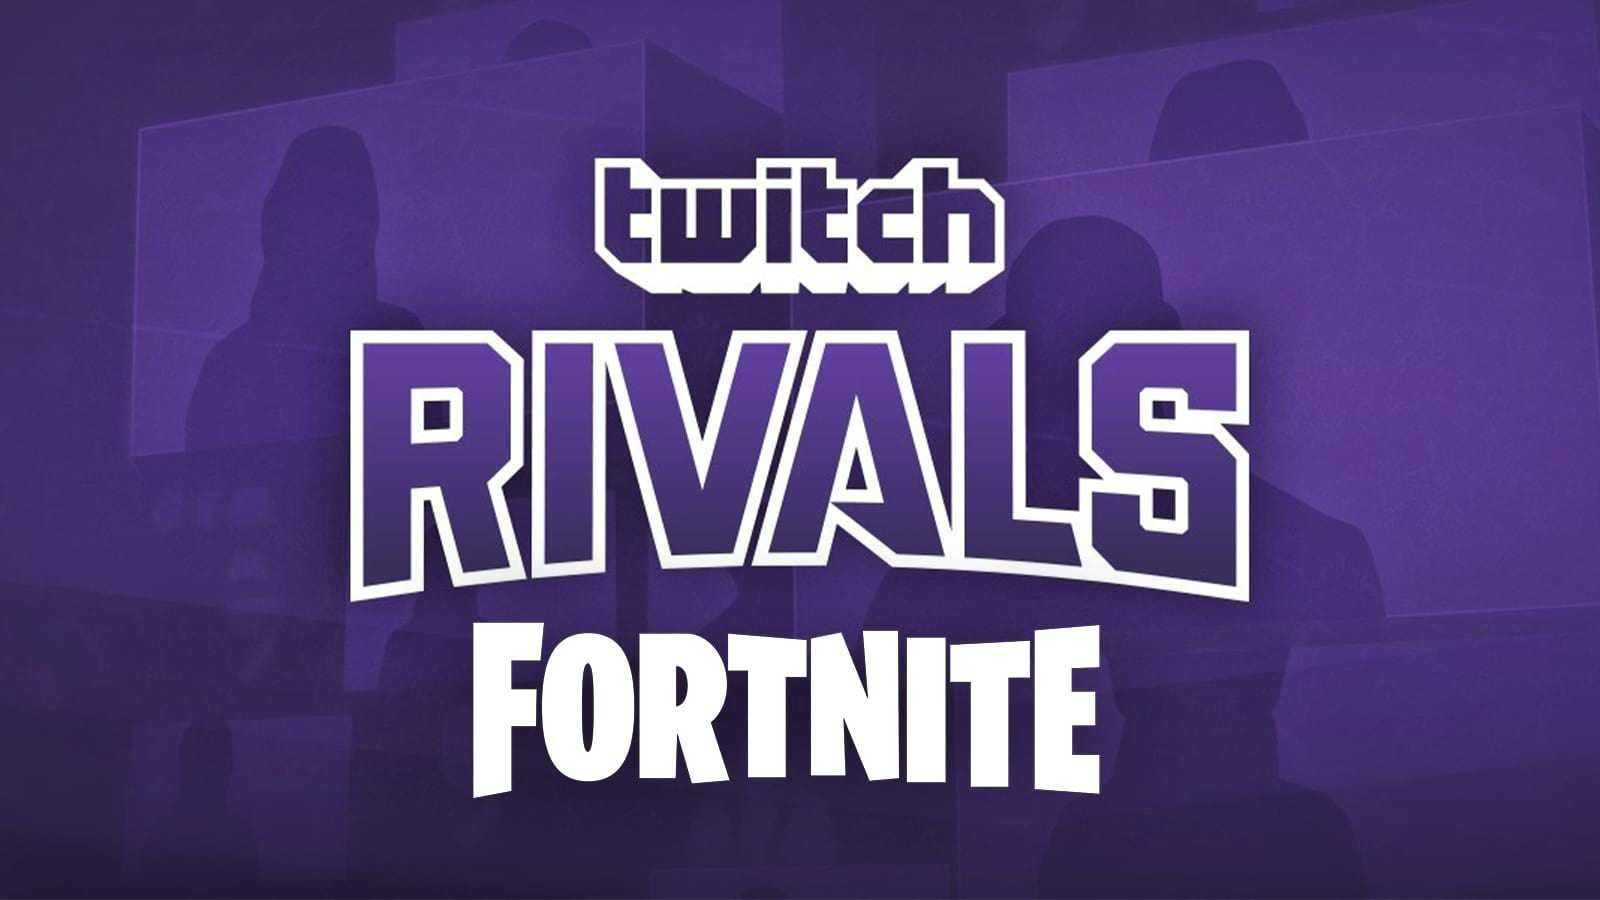 Как посмотреть турнир Twitch Соперники Fortnite на TwitchCon 2019 - Fortnite вентиляторы